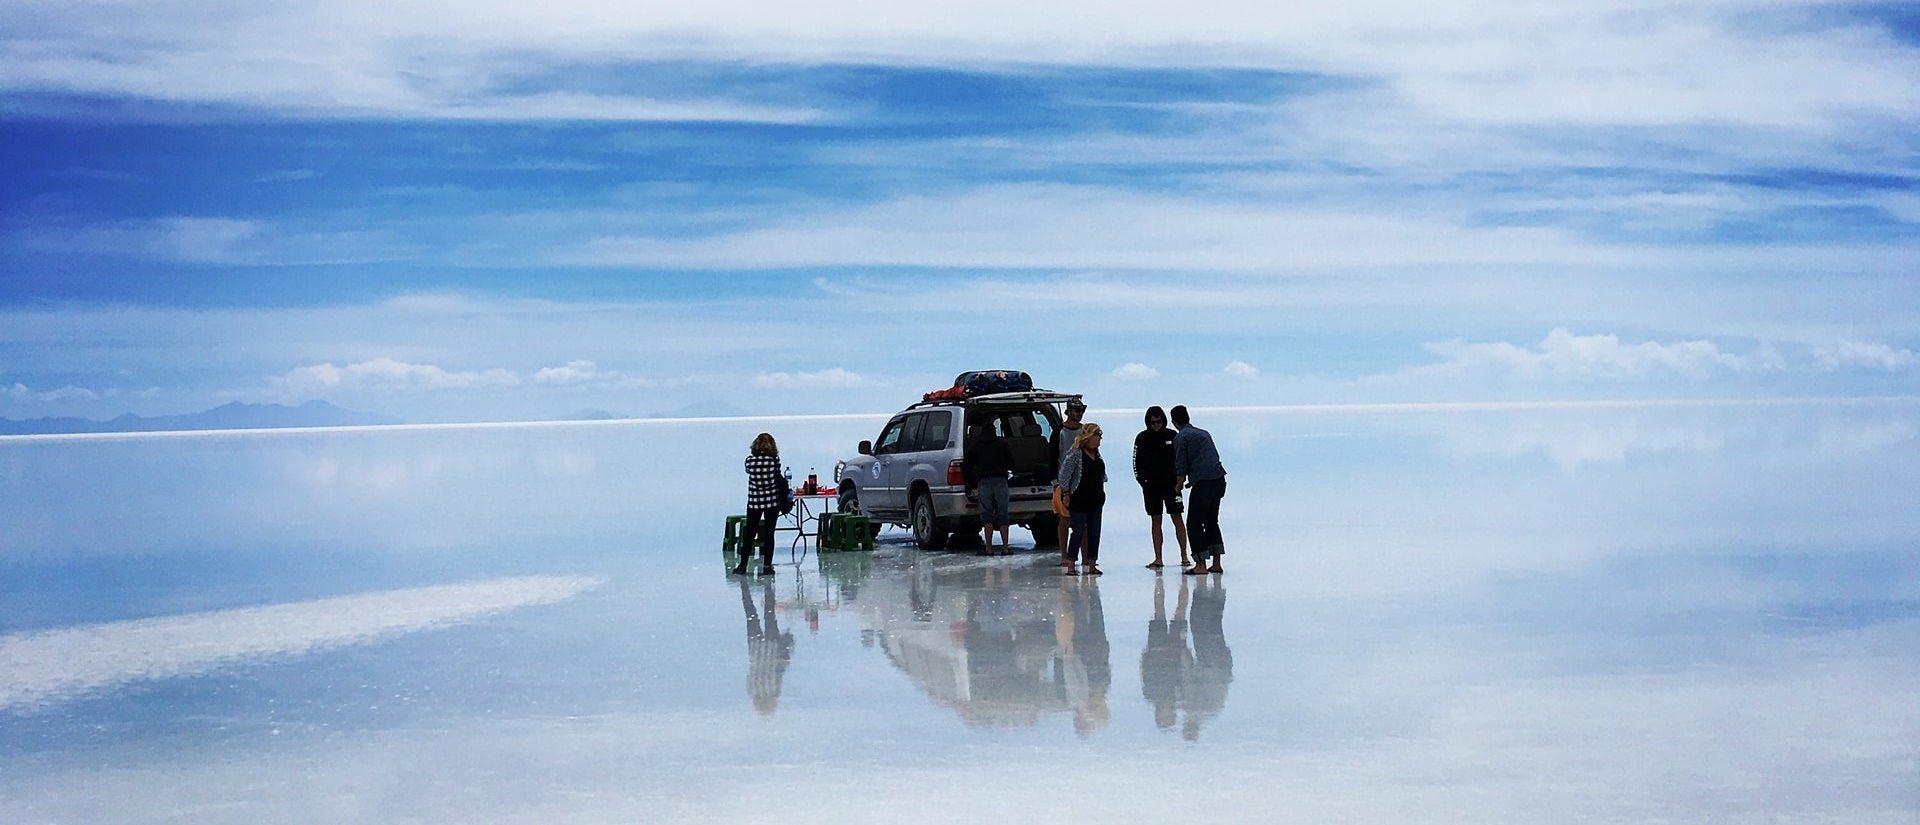 中南米地域の旅行先一覧